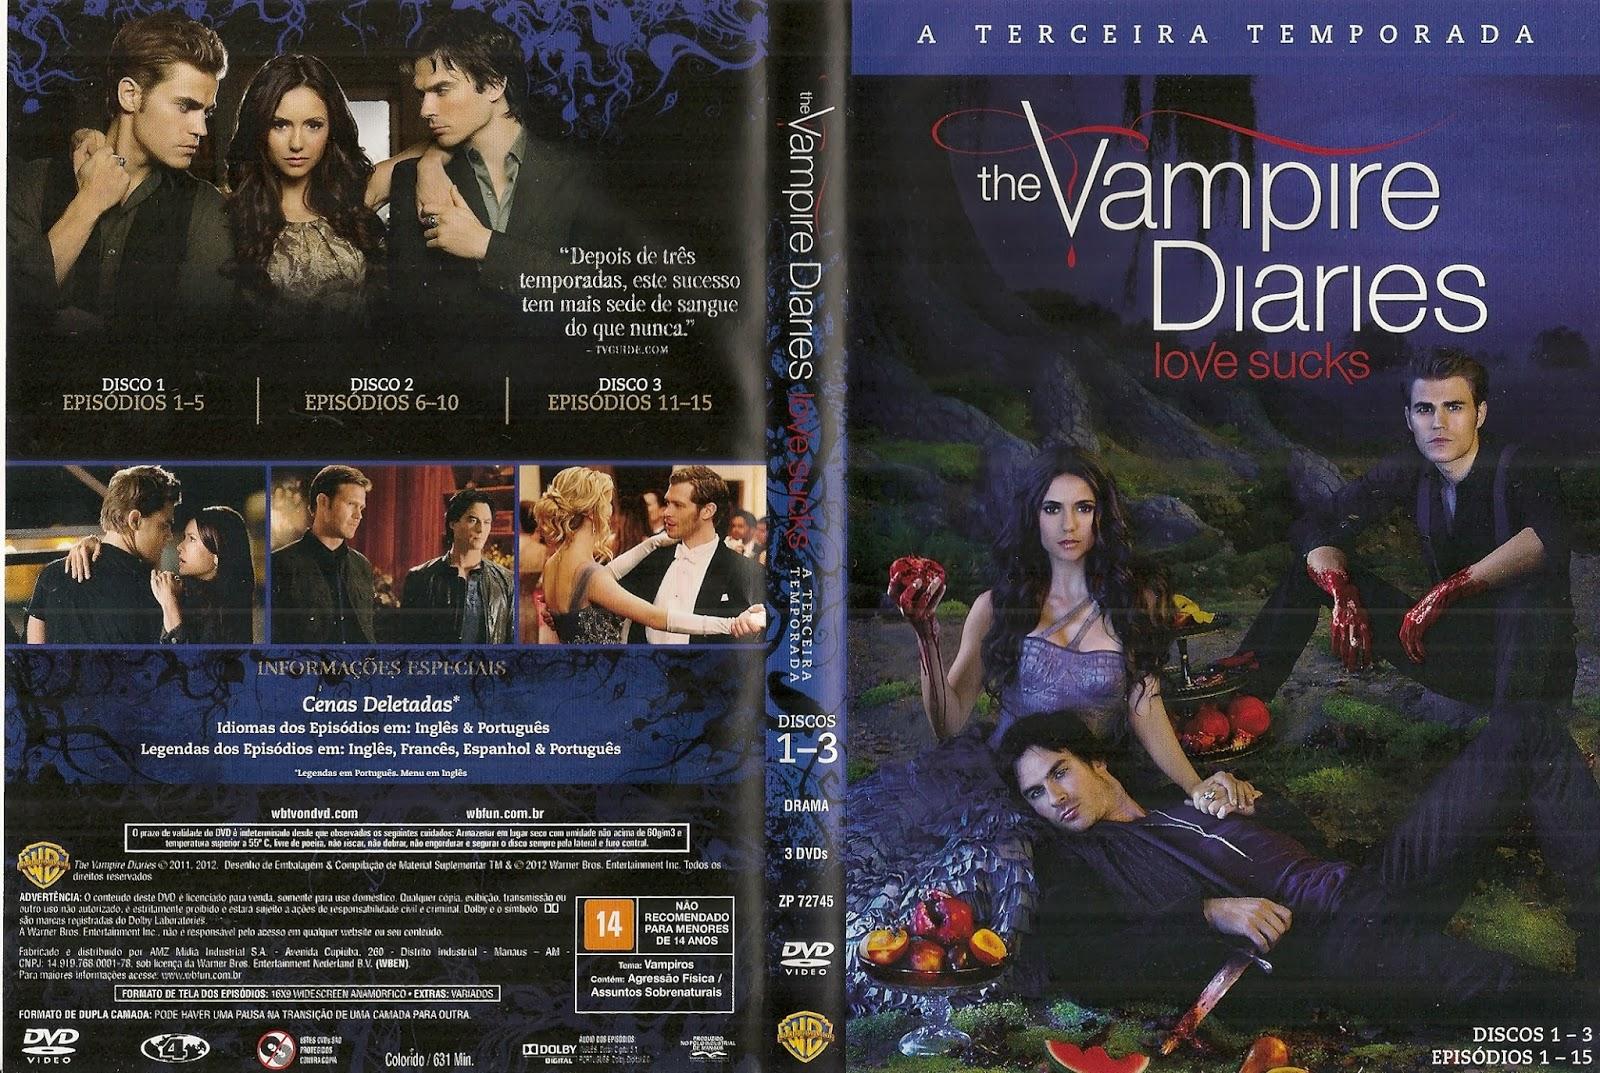 Dvd vampire diaries 2 temporada / Cast in place concrete pavers